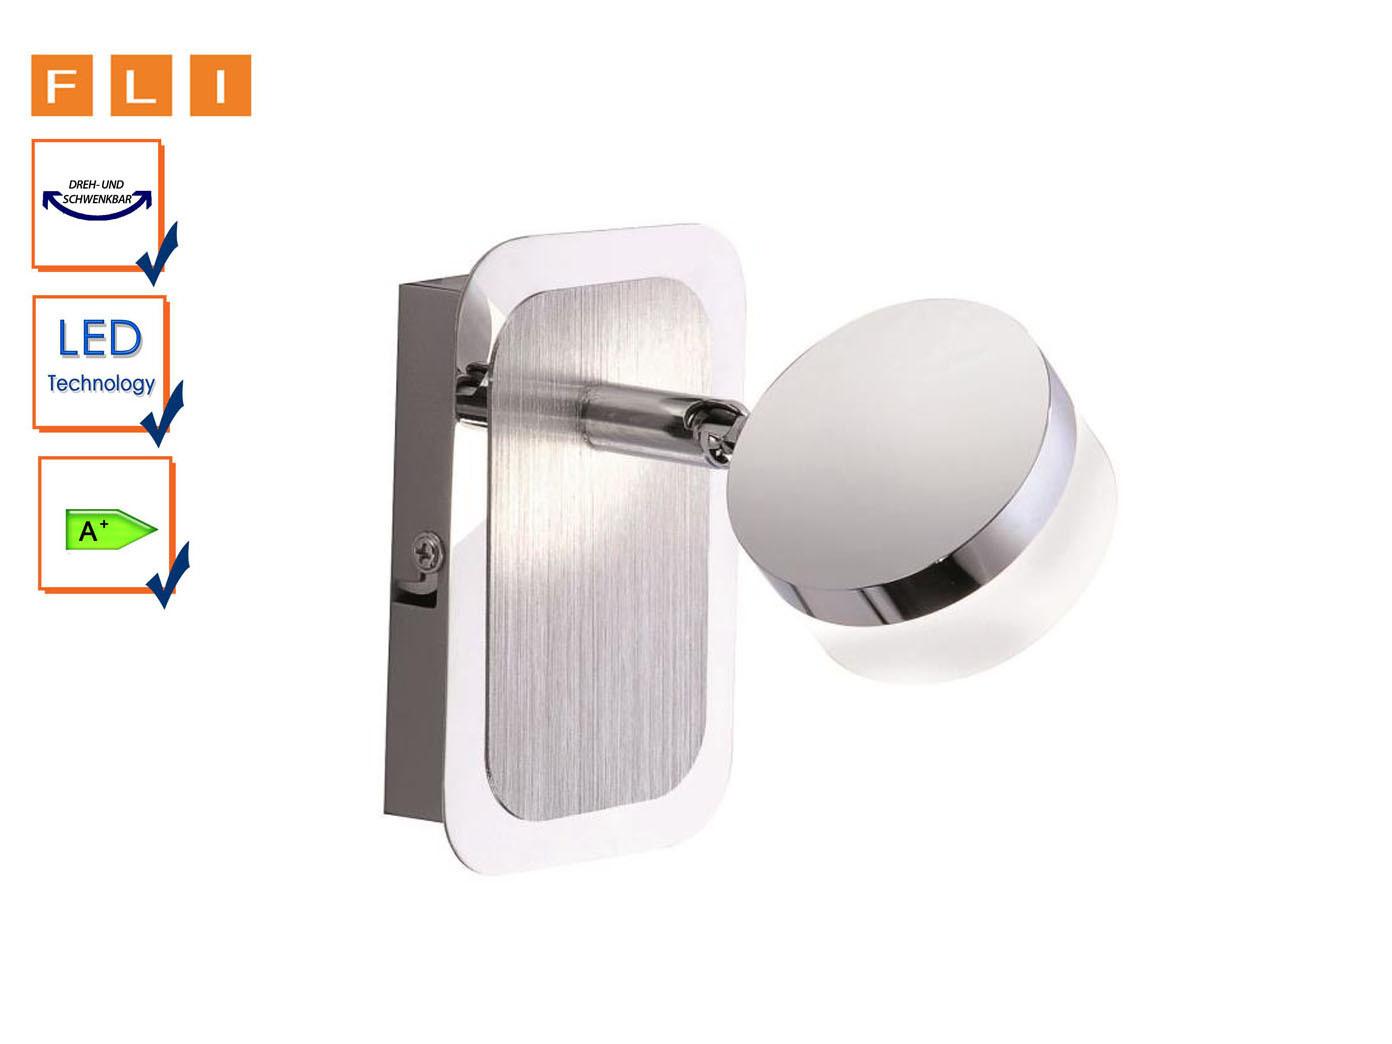 LED-Wandleuchte, Wandspot schwenkbar, Acrylglas satiniert, FLI-Leuchten FLI-Leuchten FLI-Leuchten | Spezielle Funktion  7a3d06